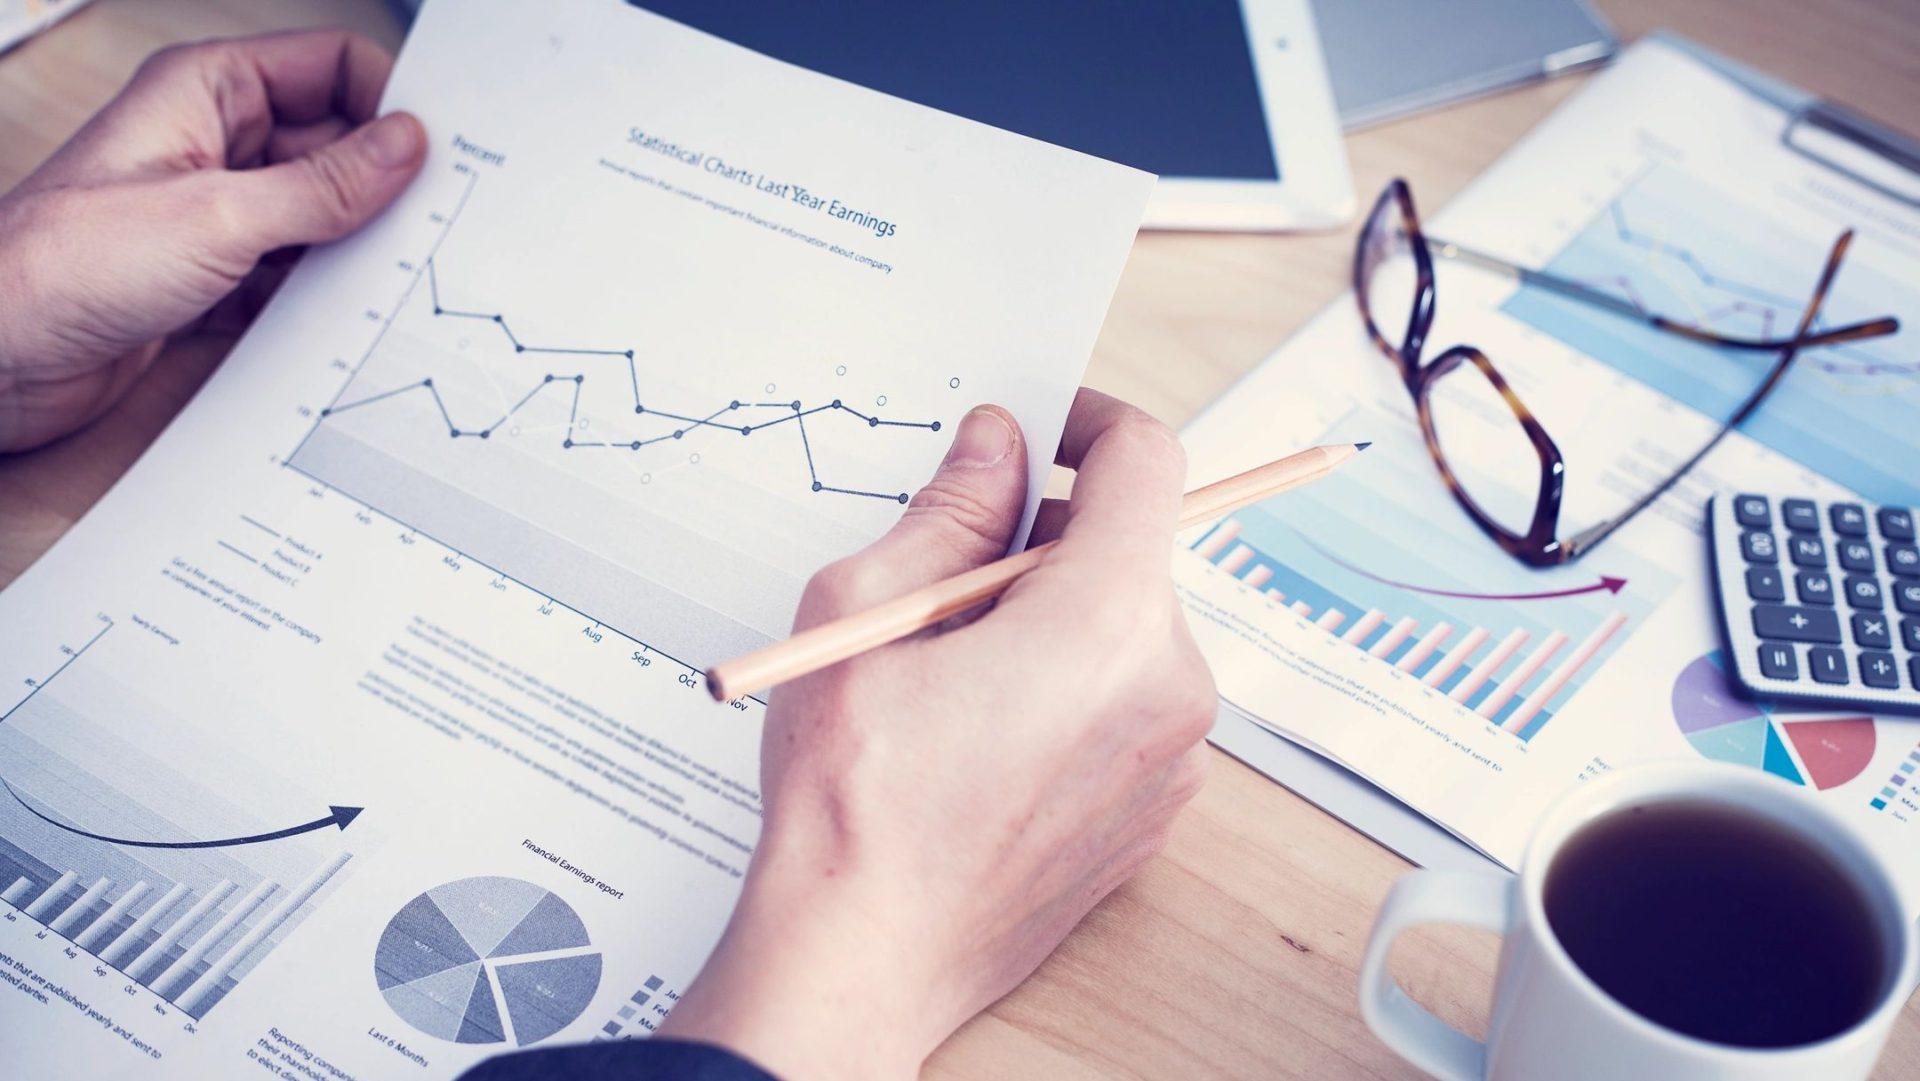 ADVANCE Human Capital Solutions